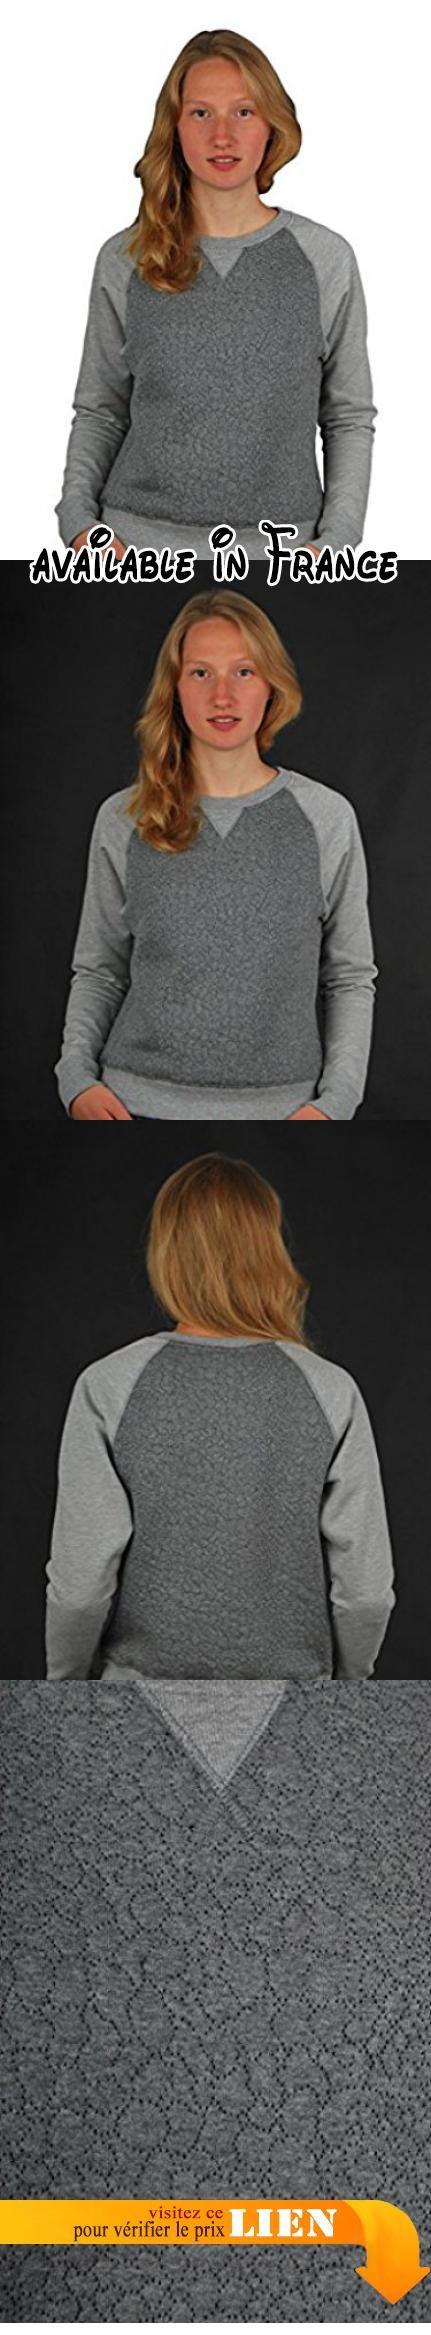 Cleptomanicx Free Sweater Heather Gray Gr. M. Cleptomanicx Free Sweater Heather Gray Gr. M #Sports #APPAREL